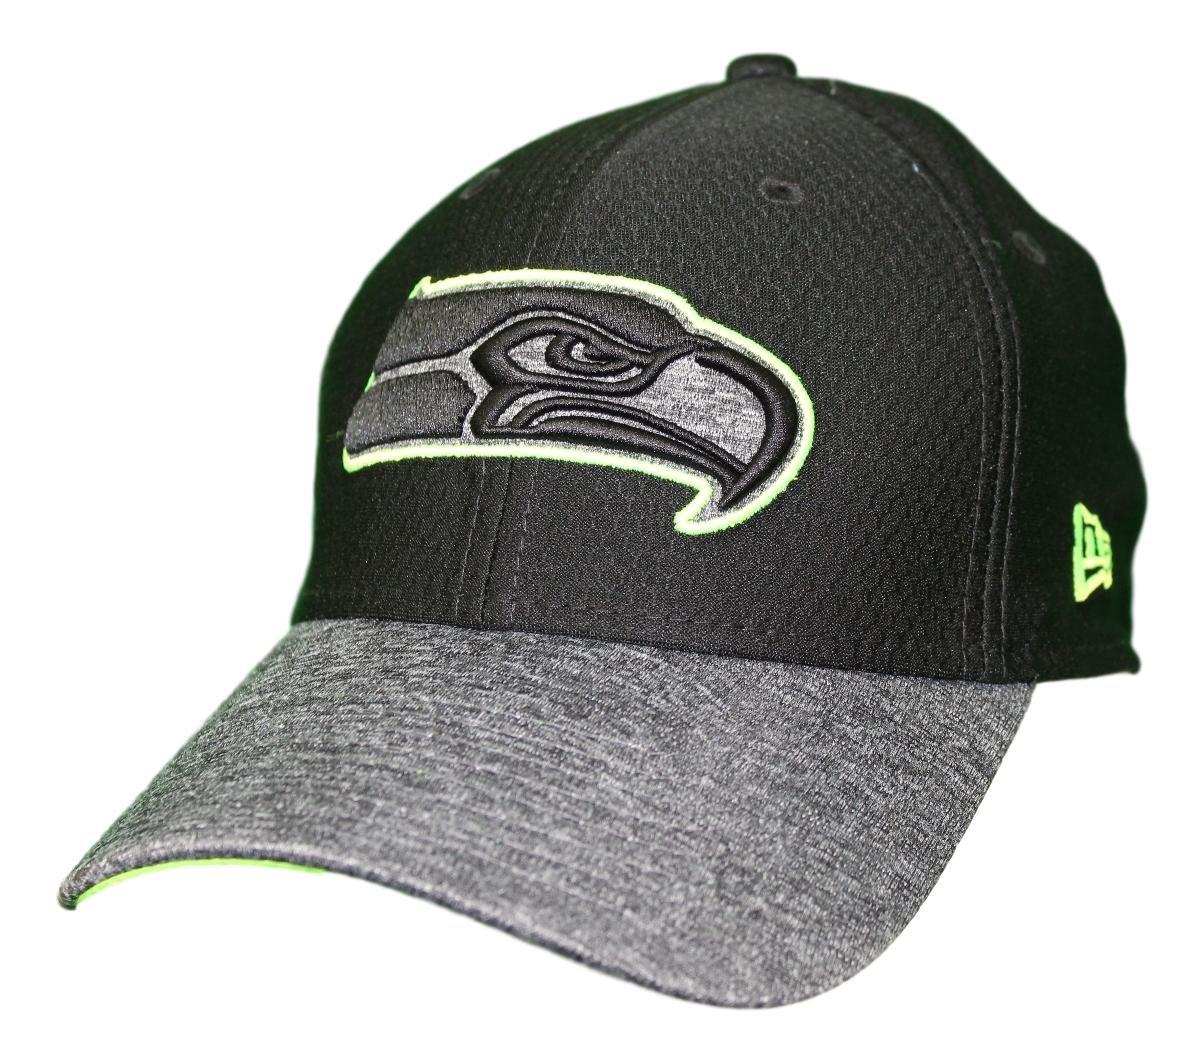 de700b1a Amazon.com : New Era Seattle Seahawks NFL 39THIRTY Popped Shadow Flex Fit  Hat - Black : Clothing